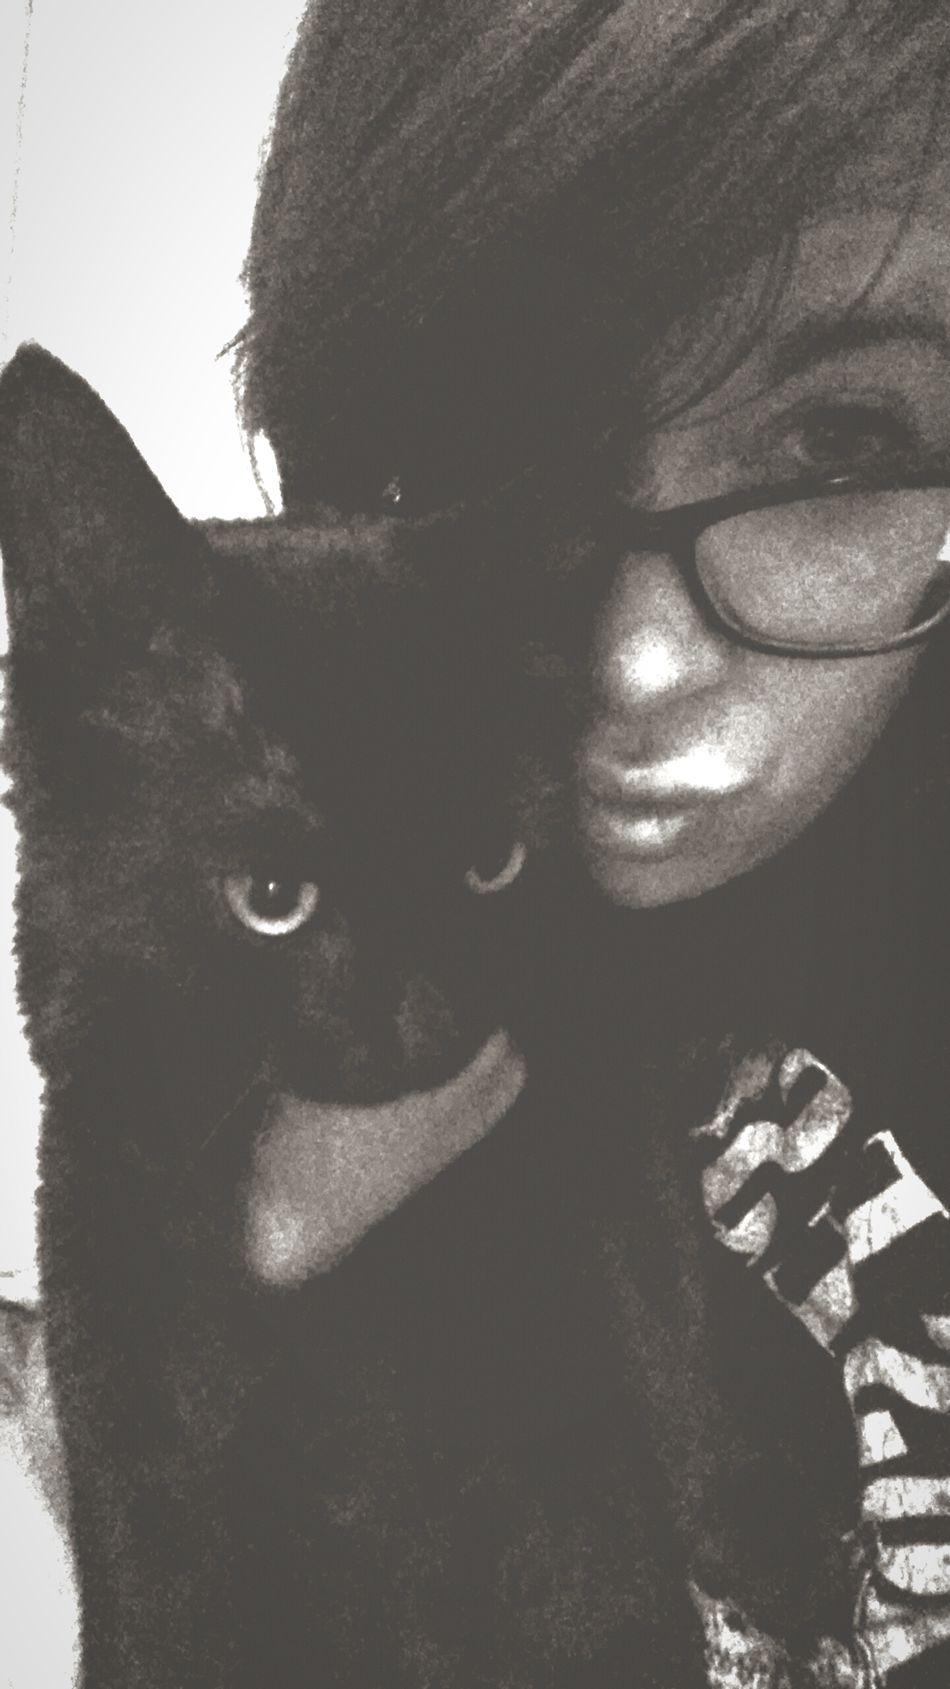 Salem Kitty Cat NewAddition Meow Purr BLackCat Blackcatsbringluck Followme Ilovemycat